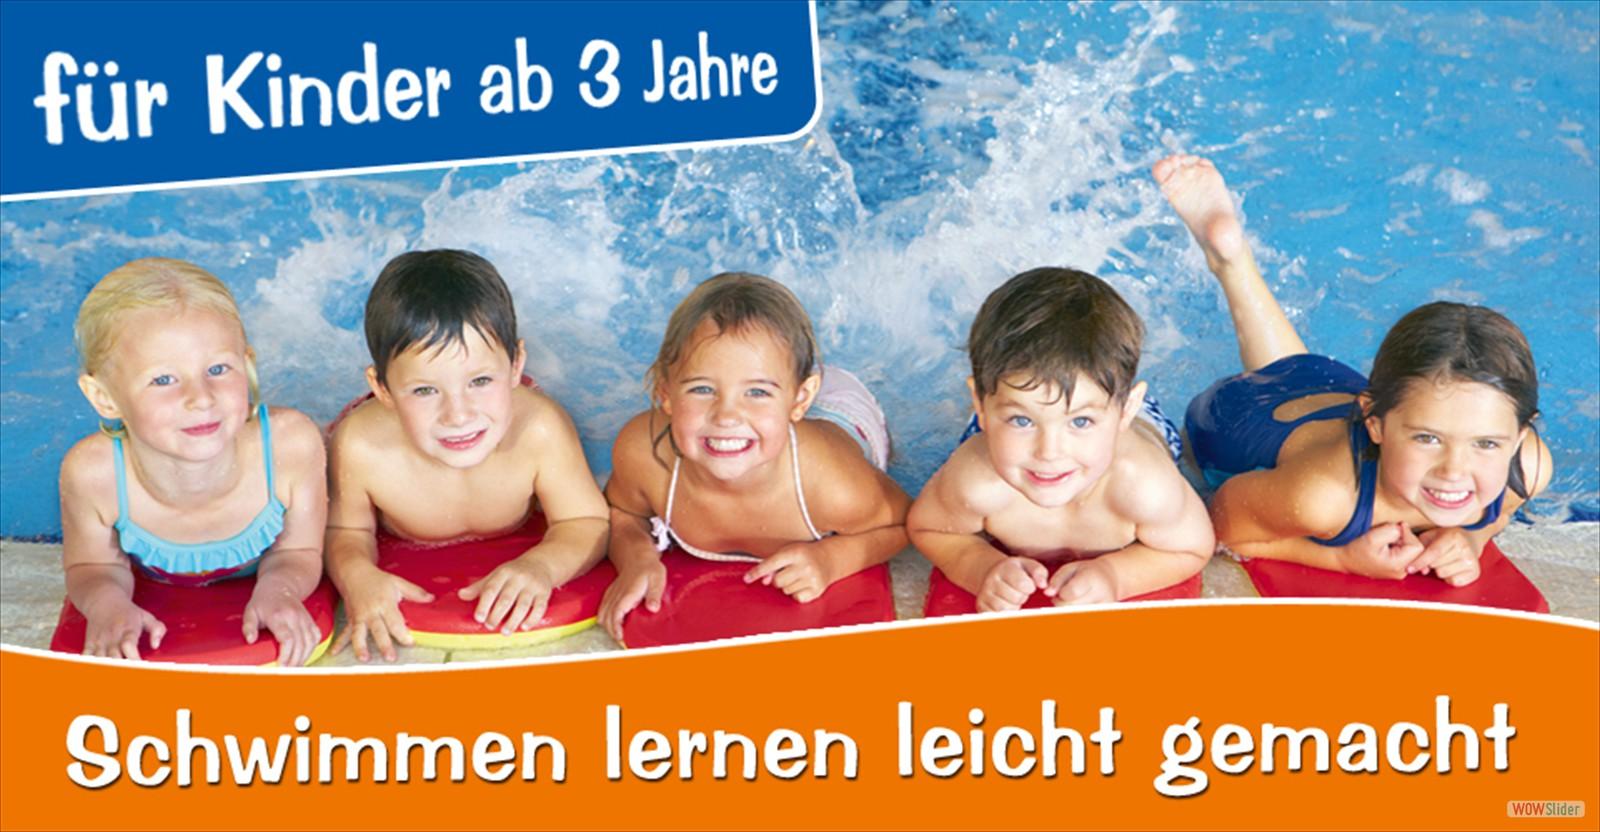 Schwimmschule in Halle / Saalekreis